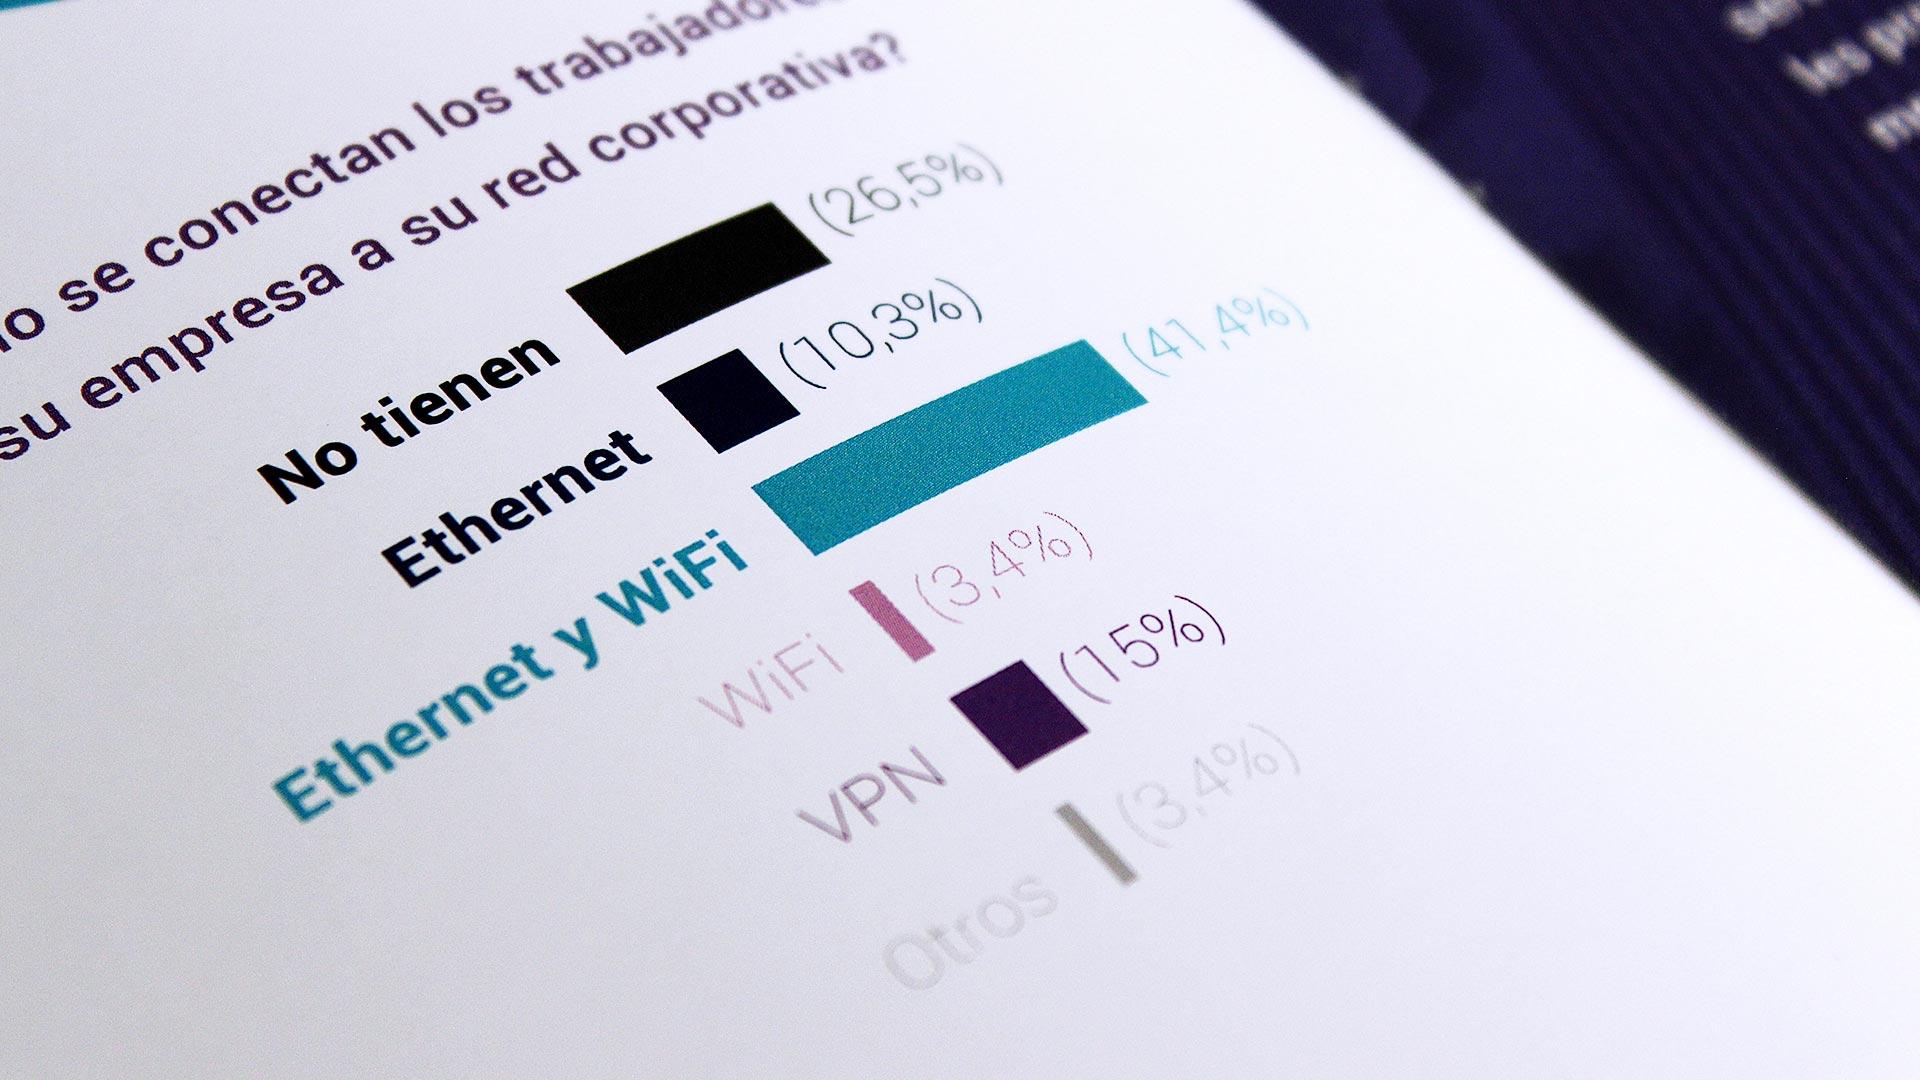 alcatel-content-marketing-informe-resumen-ejecutivo-networkondemand-ebook-2016-14